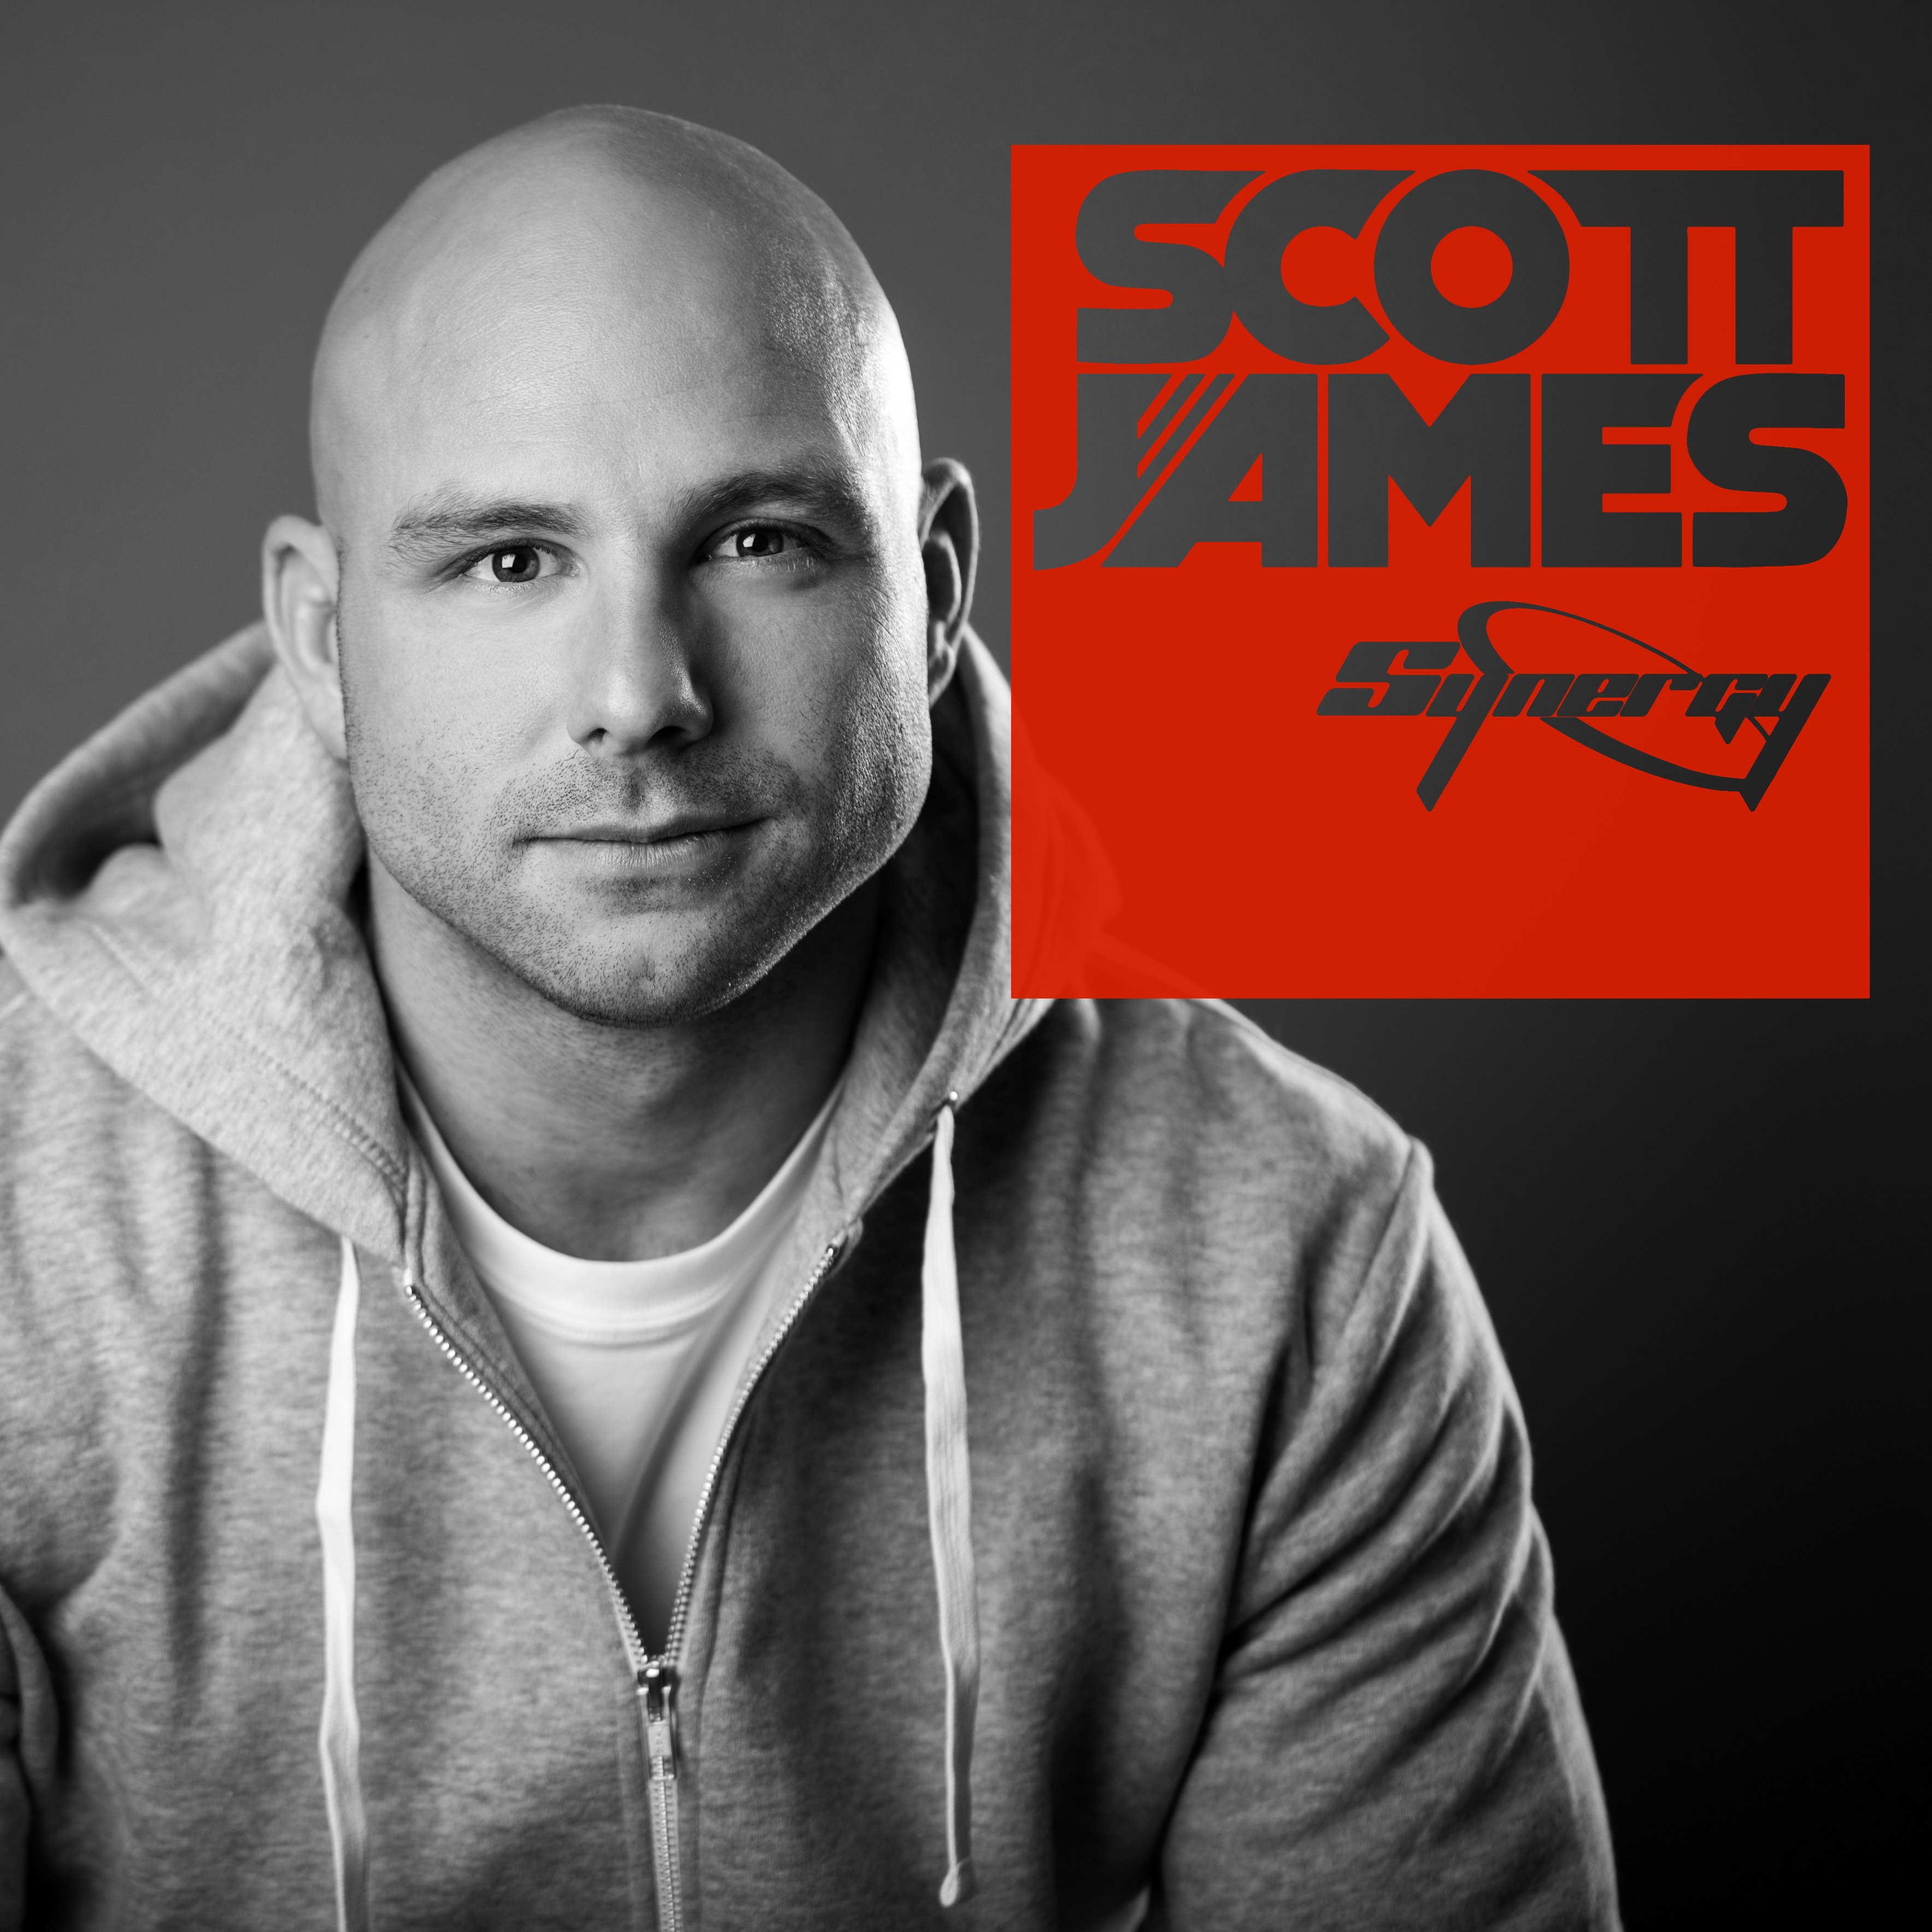 Scott James Synergy logo